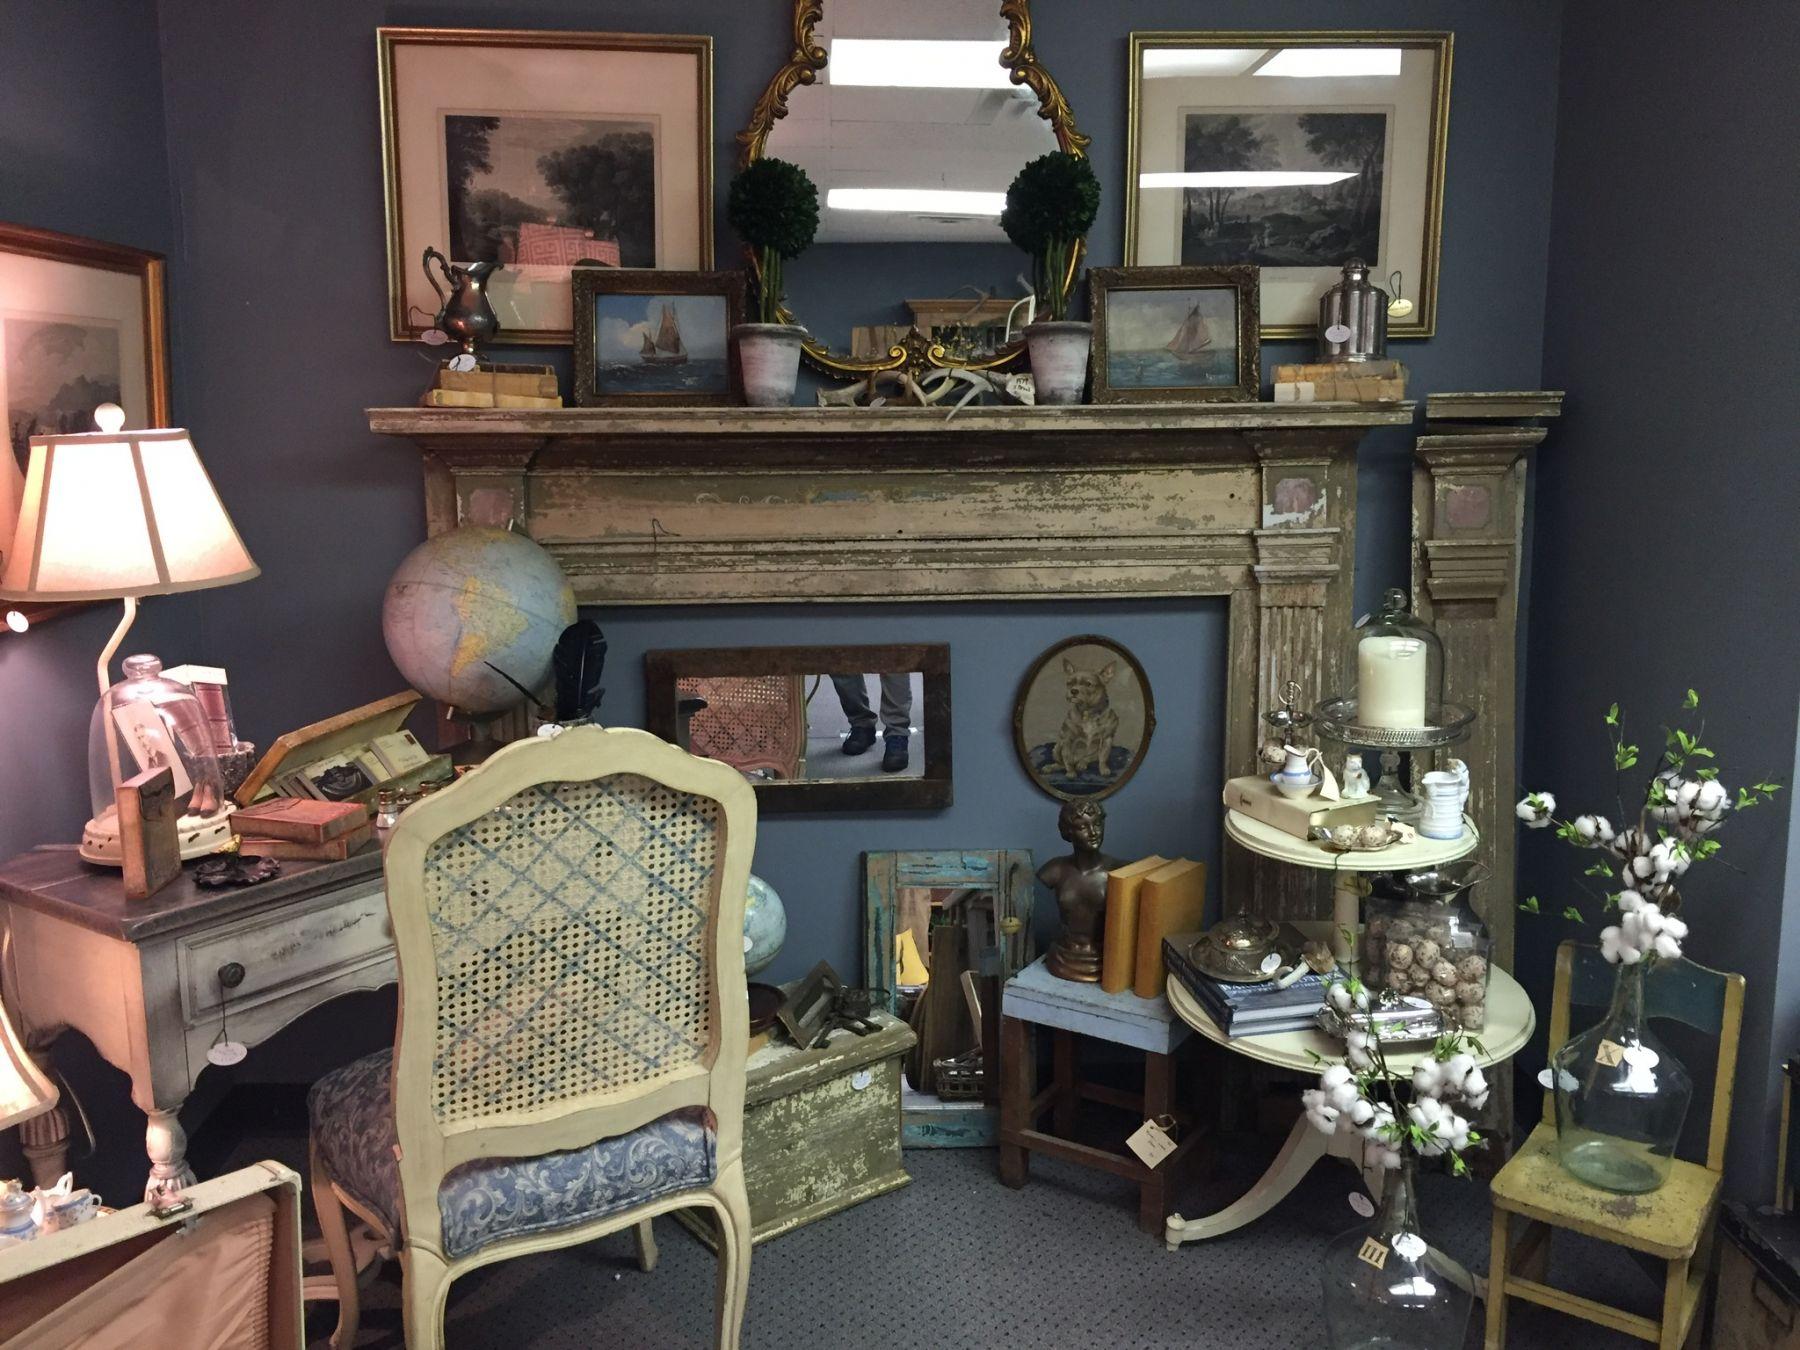 100 Furniture Stores In South Bend Mishawaka Indiana Mishawaka Hotels Candlewood Suites